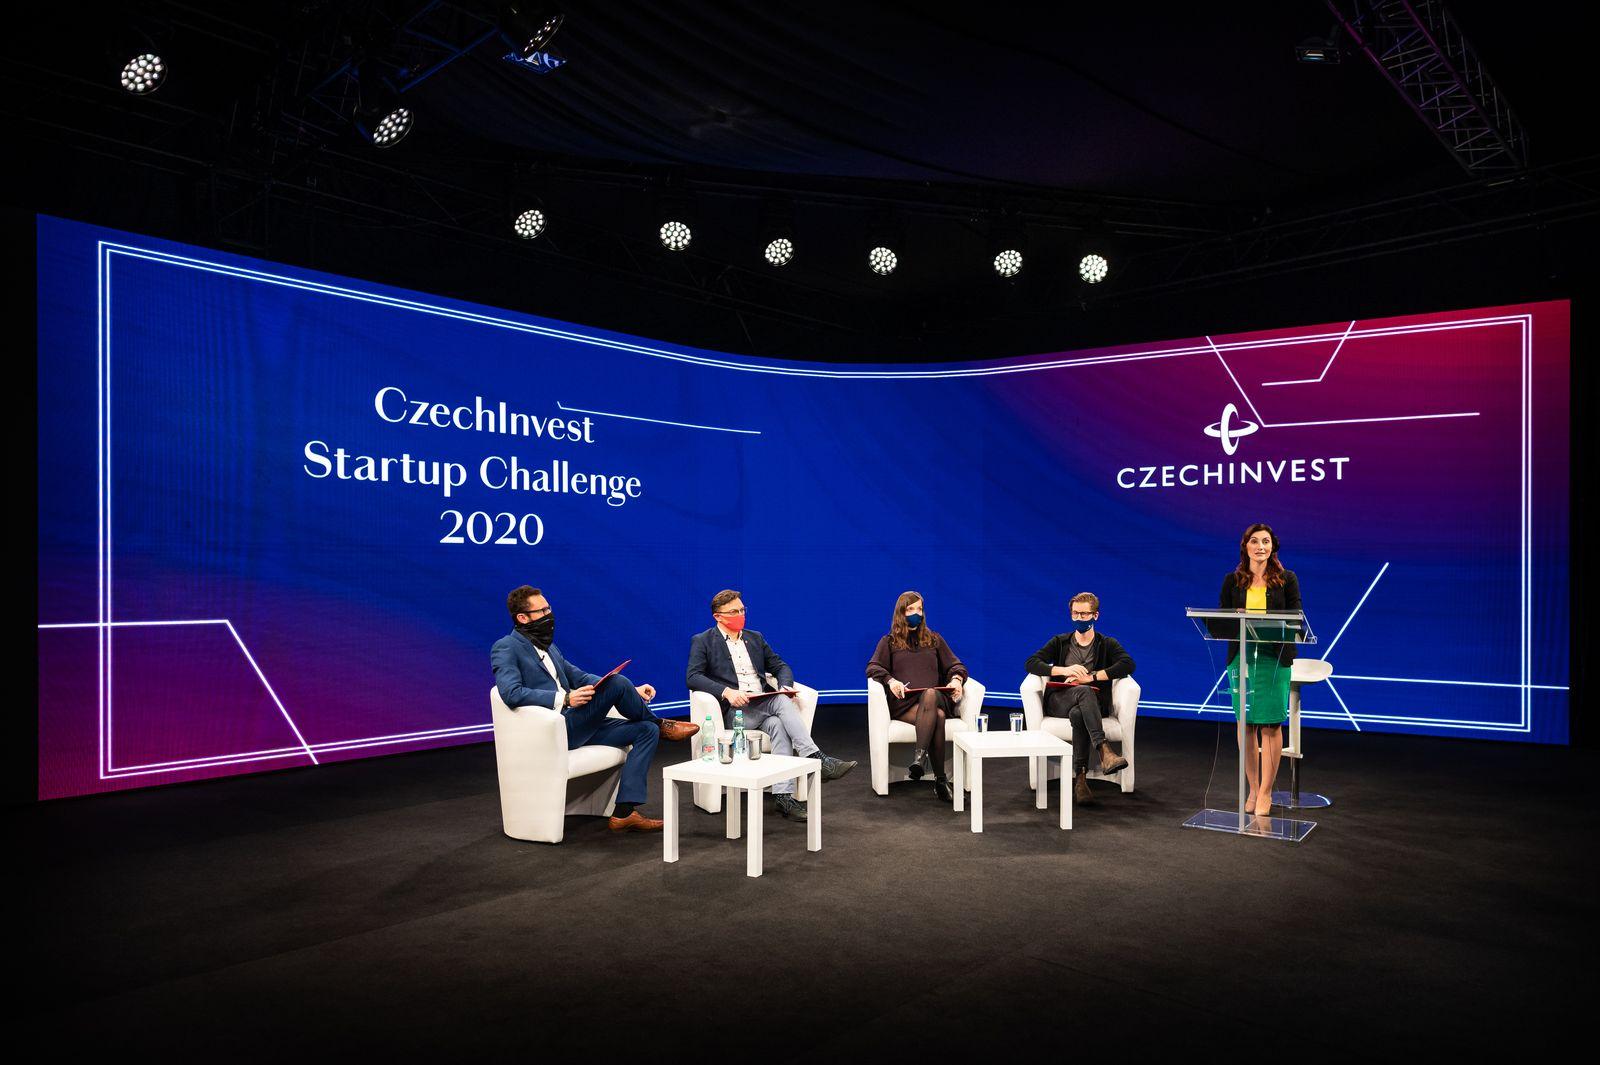 CzechInvest Startup Challenge 2020 1600